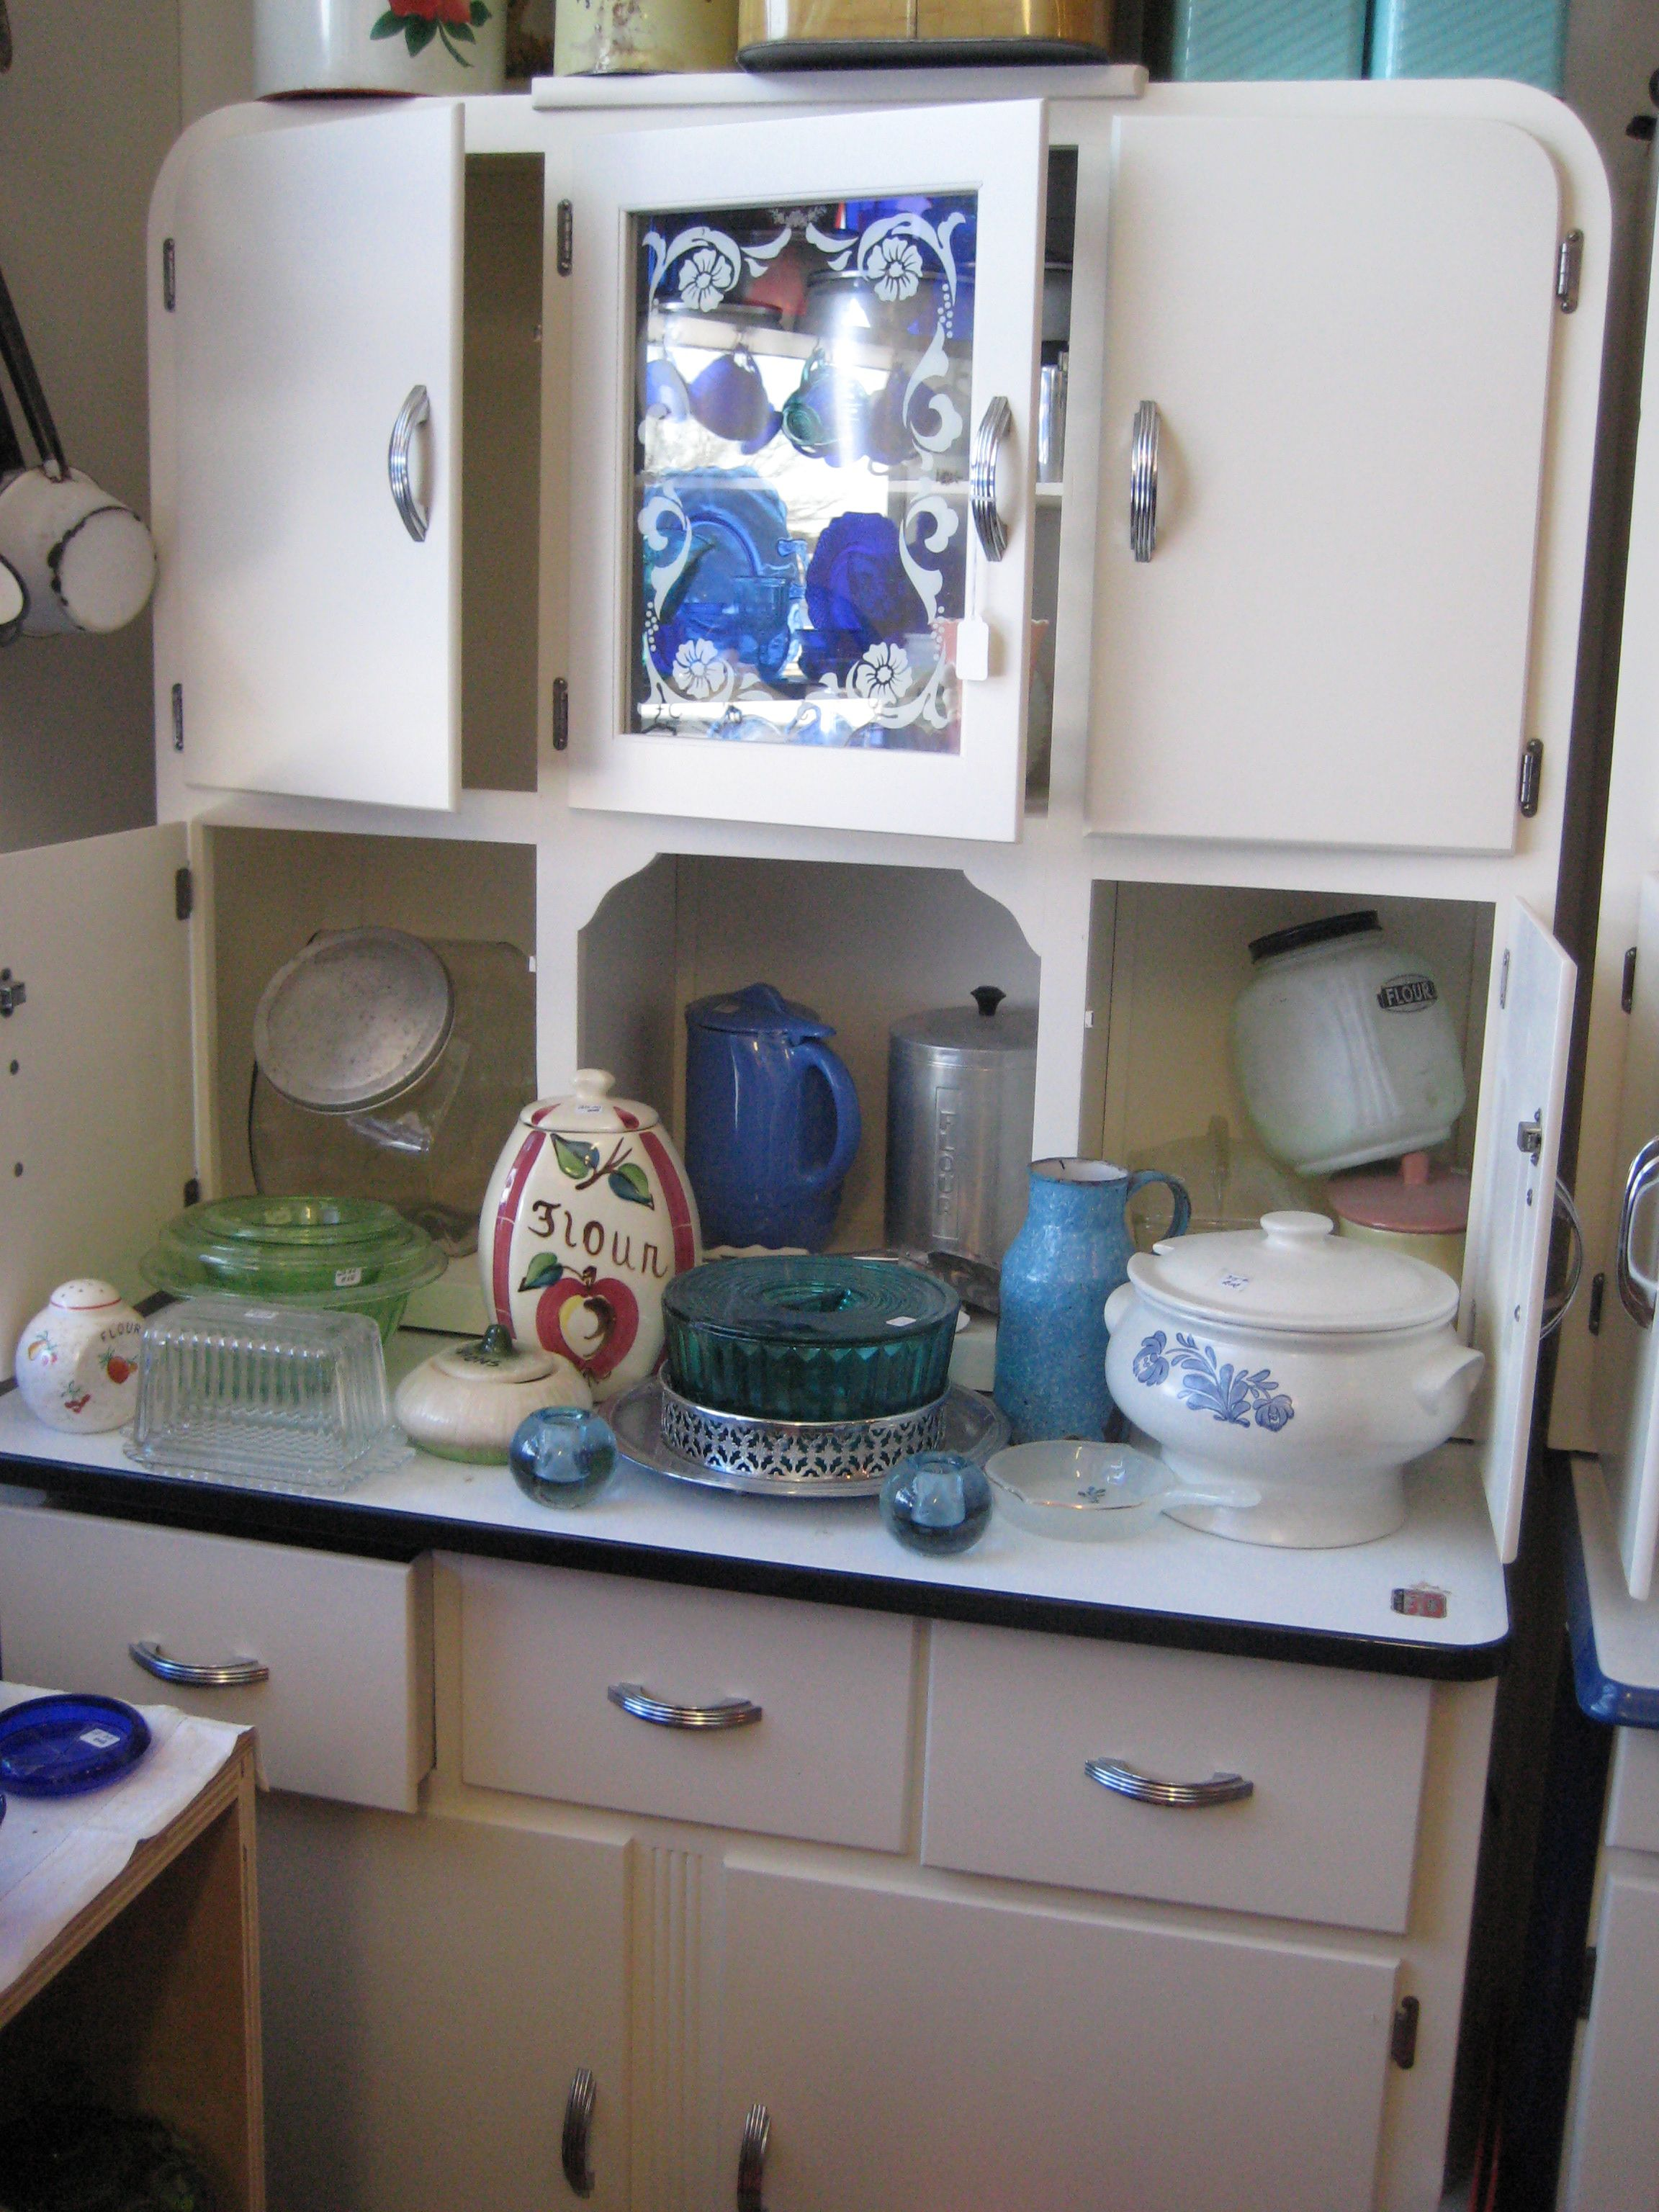 Hoosier Style Vintage Kitchen Cabinets Vintage Kitchen Cabinets Vintage Cabinets Hoosier Cabinet